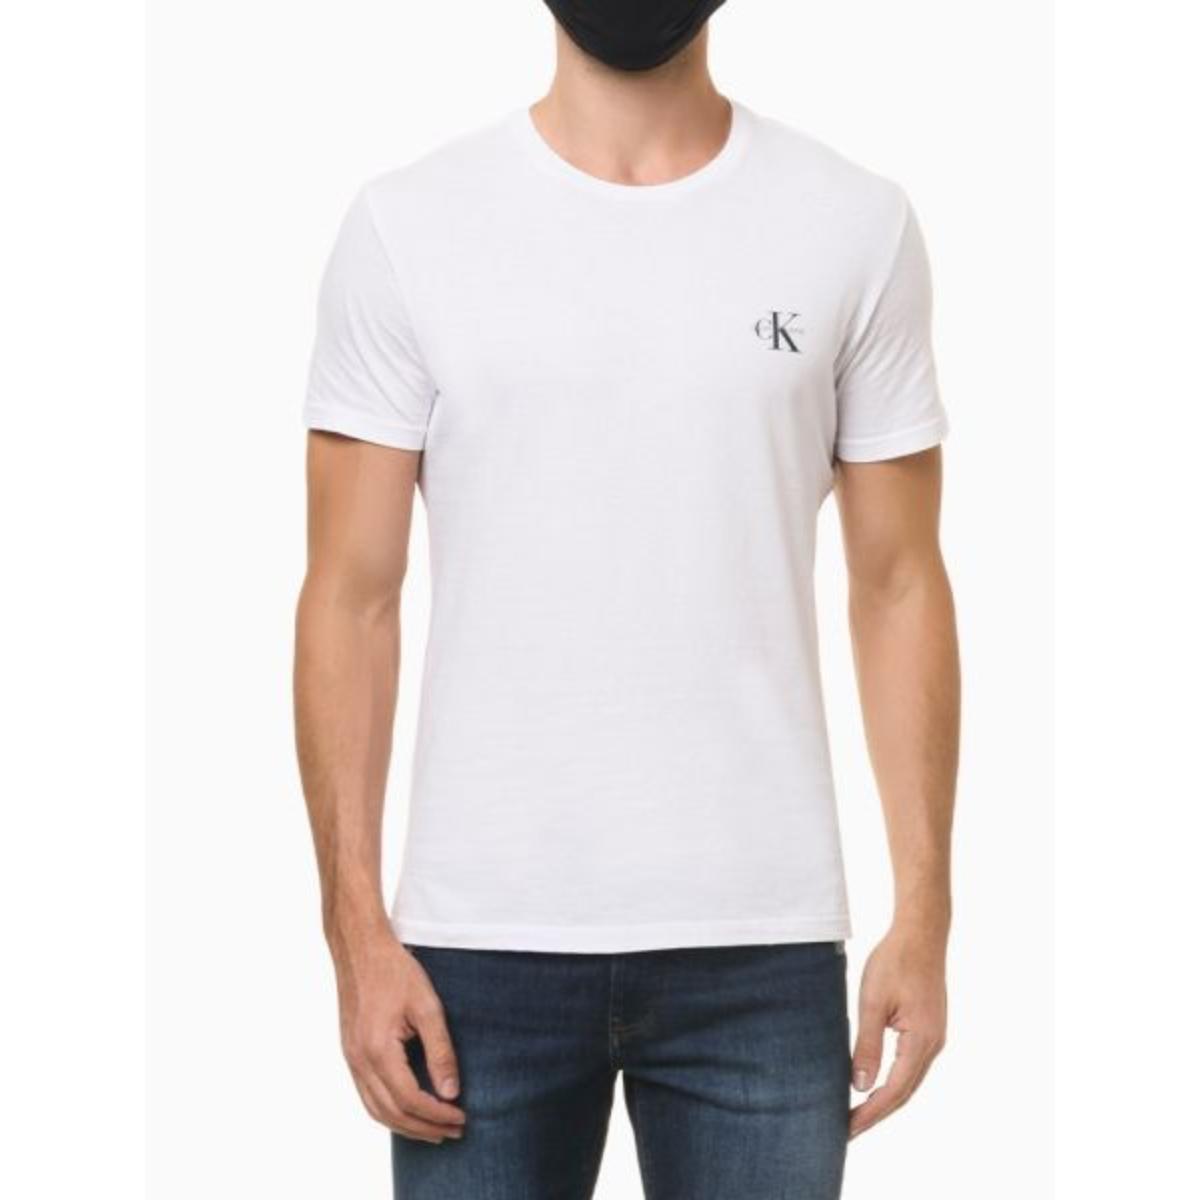 Camiseta Masculina Calvin Klein Ckjm103 Branco